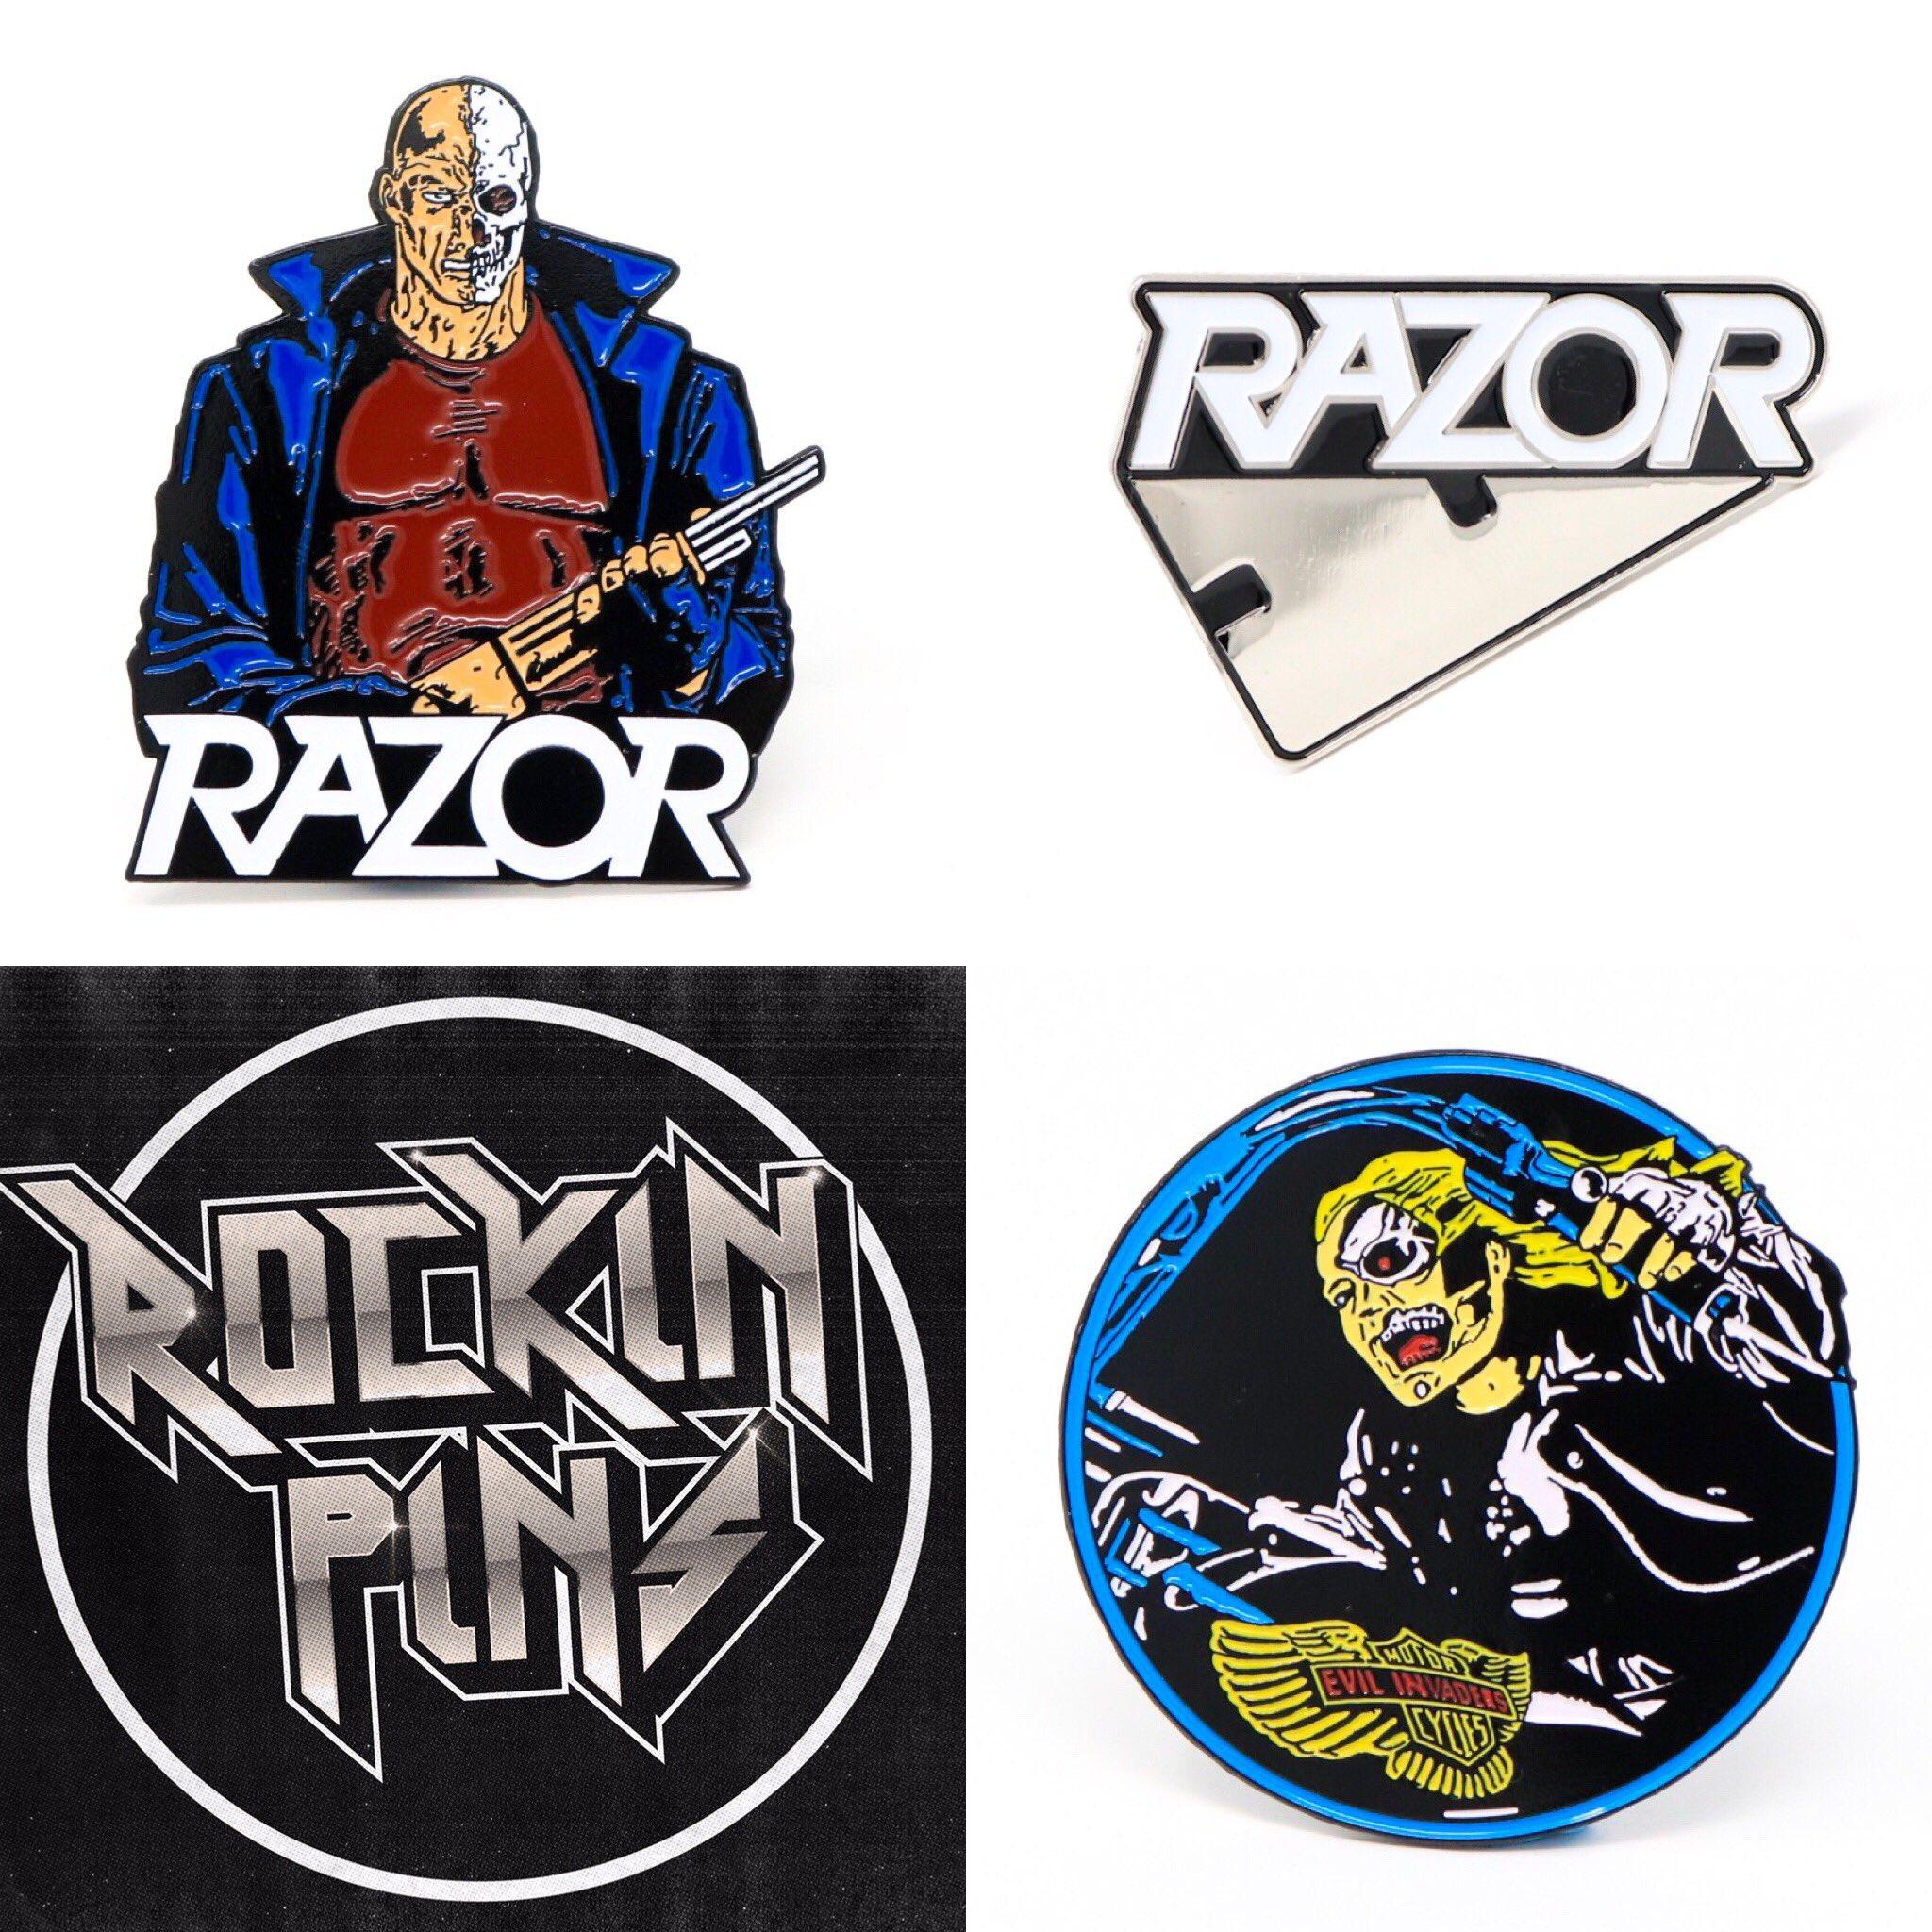 Officially licensed 'Razor' enamel pins now available at https://t.co/QxRdbtwwby ! @davecarlorazor https://t.co/XASPBBw3dG